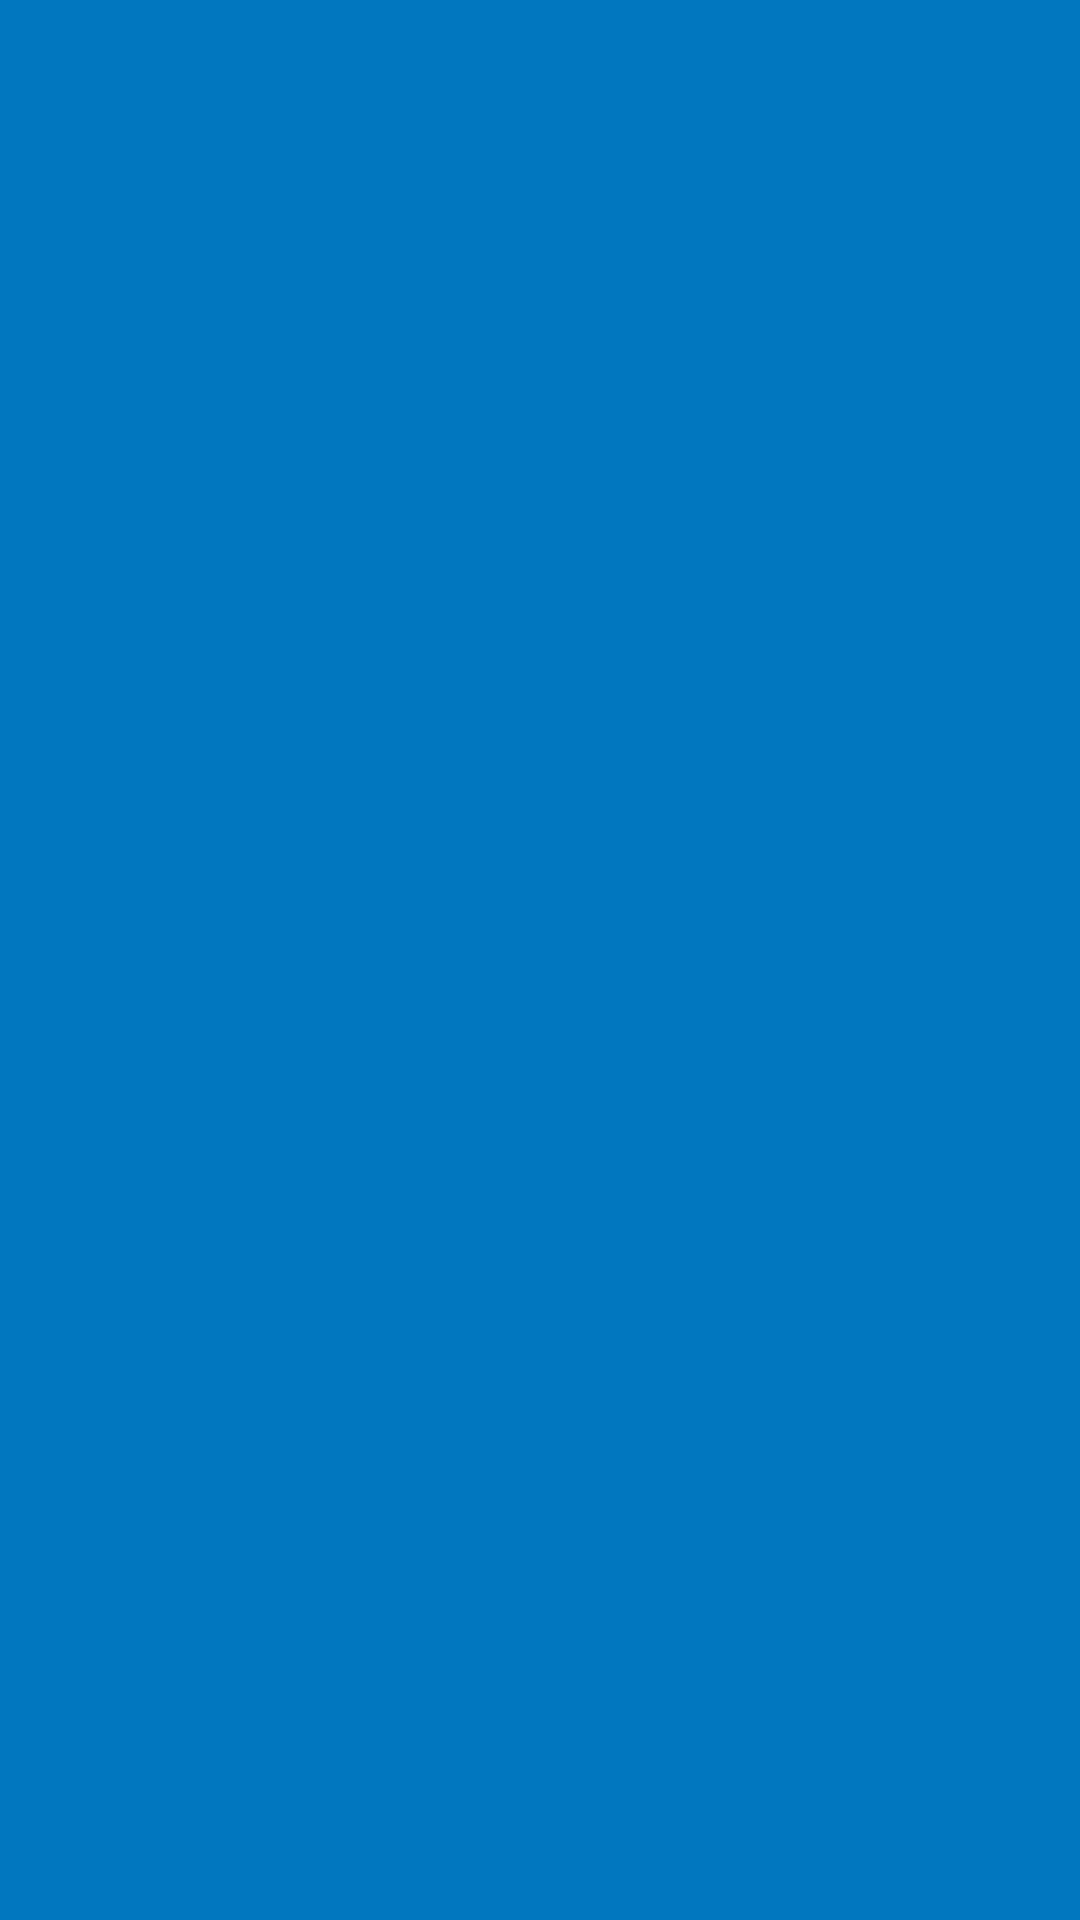 1080x1920 Ocean Boat Blue Solid Color Background